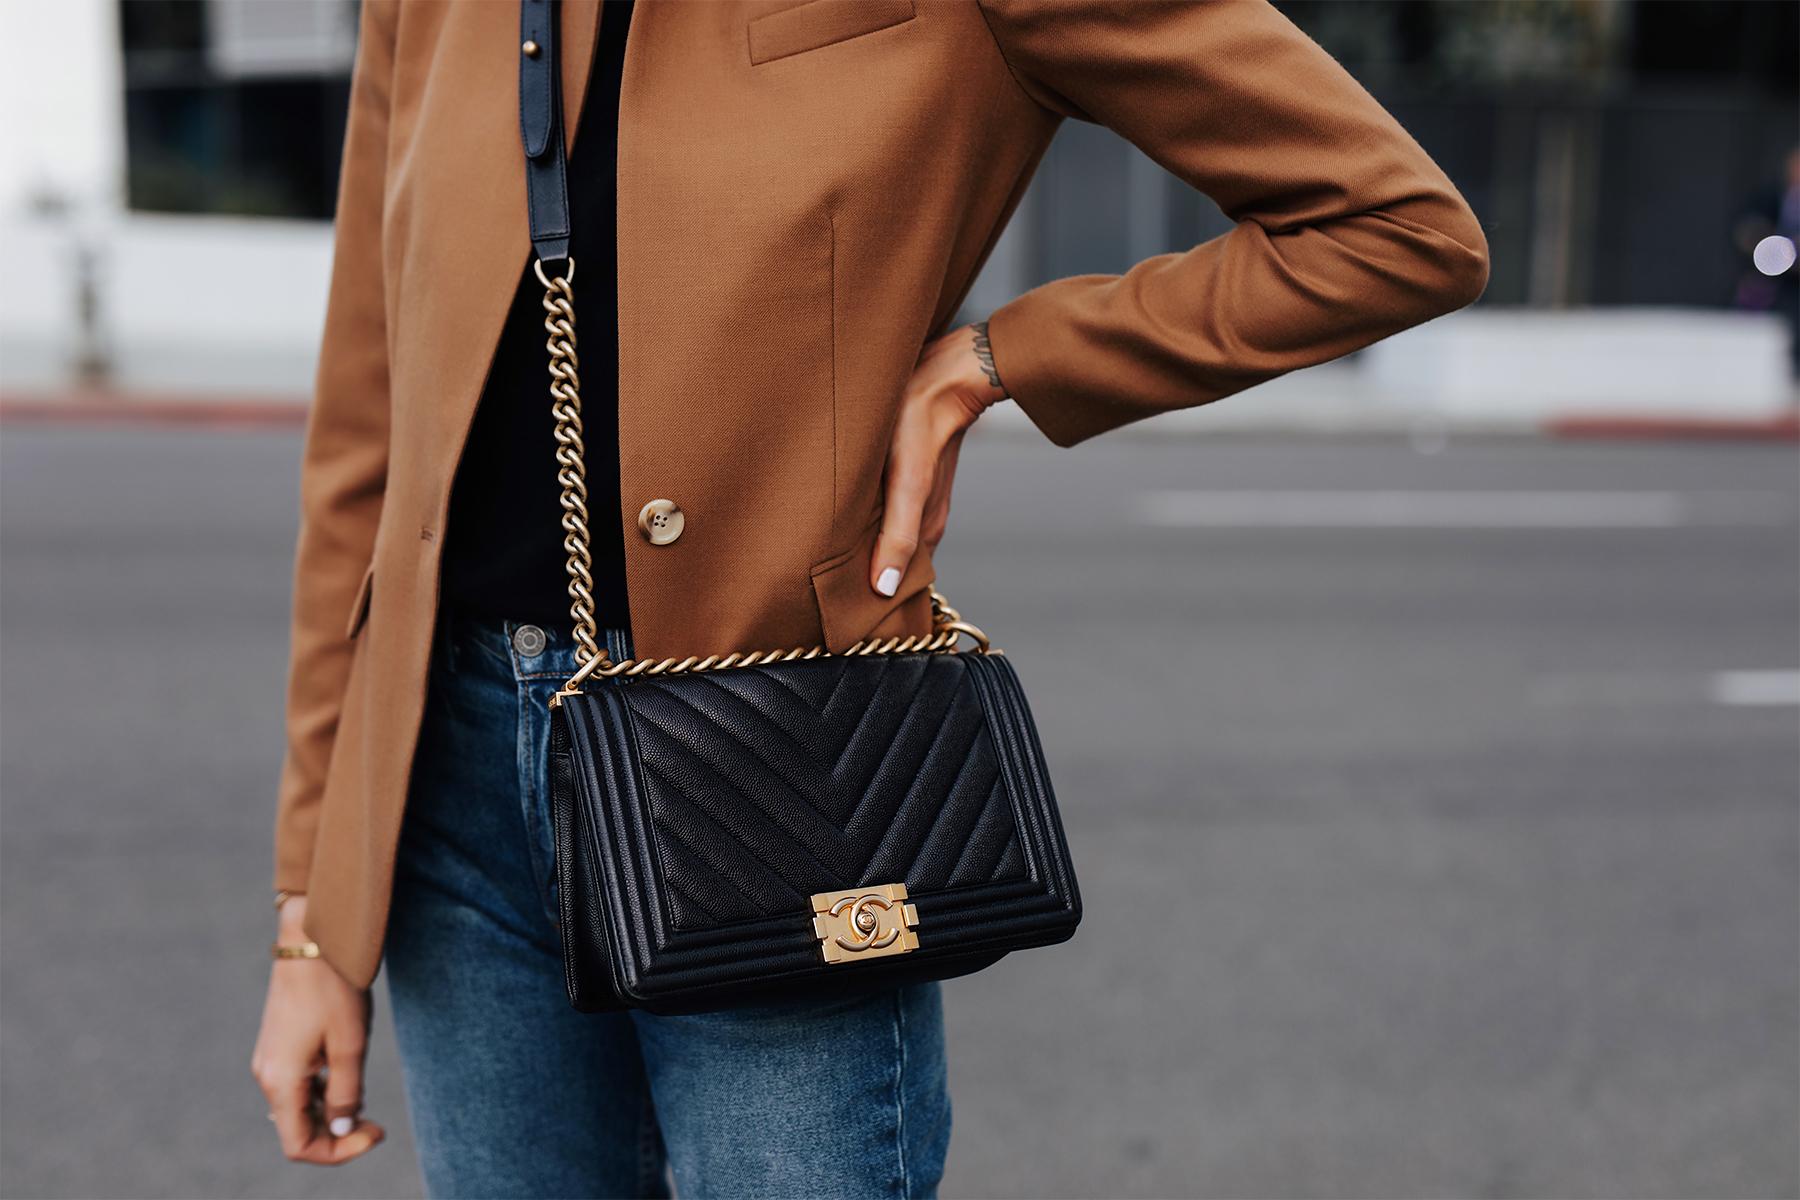 Woman Wearing Camel Blazer eBay Authenticate Chanel Black Boy Bag Fashion Jackson San Diego Fashion Blogger Street Style